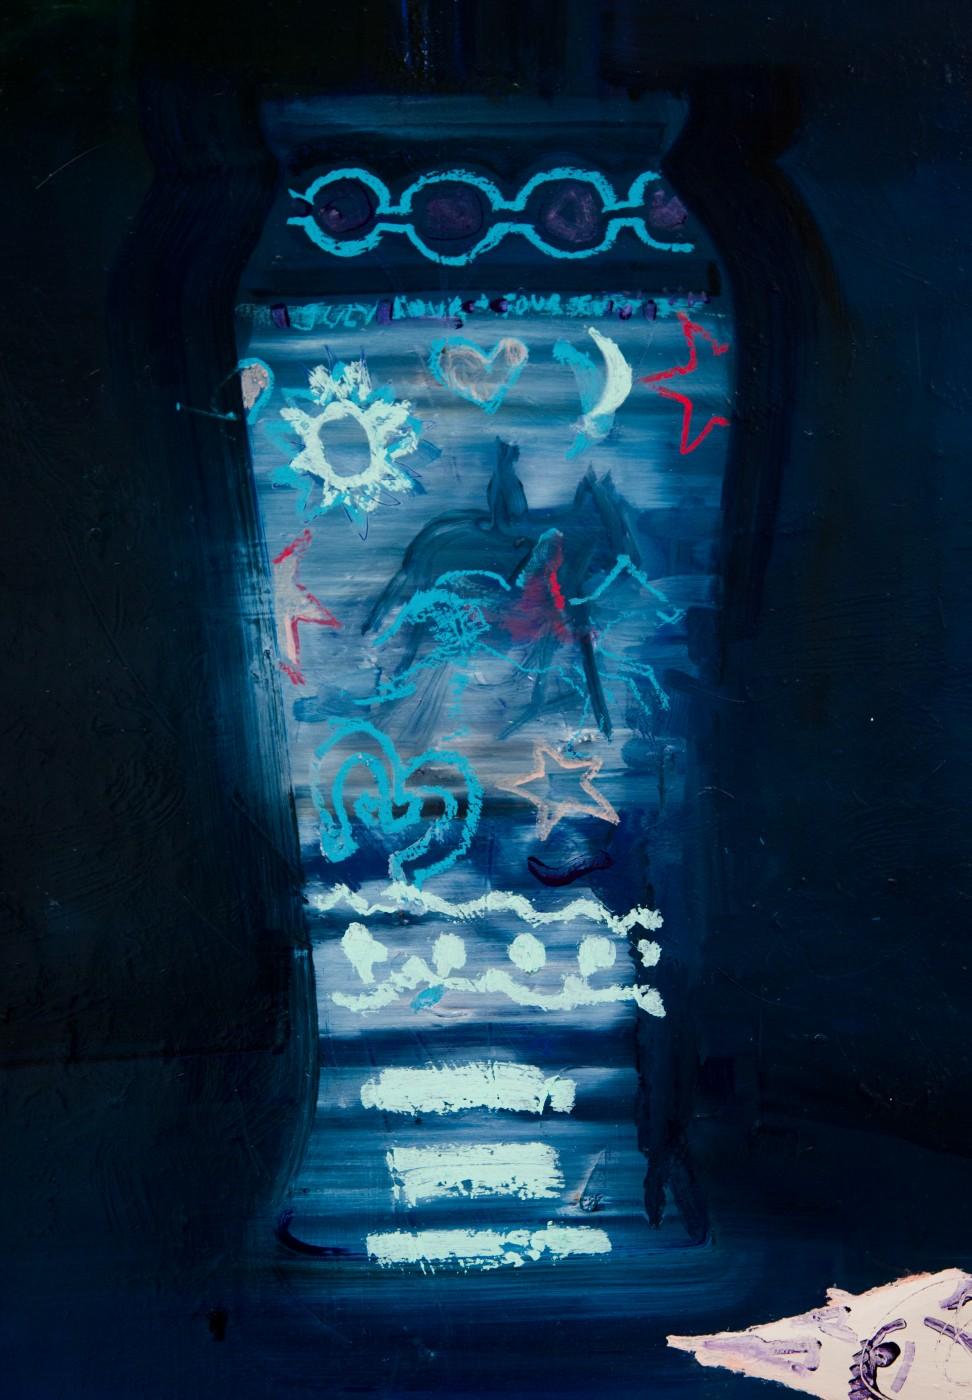 WALLFLOWERS, MALFLOWERS  July 4+4  (detail), 2018  Oil on canvas  152,4 × 101,6 cm / 60 × 40 in  Nathan Zeidman